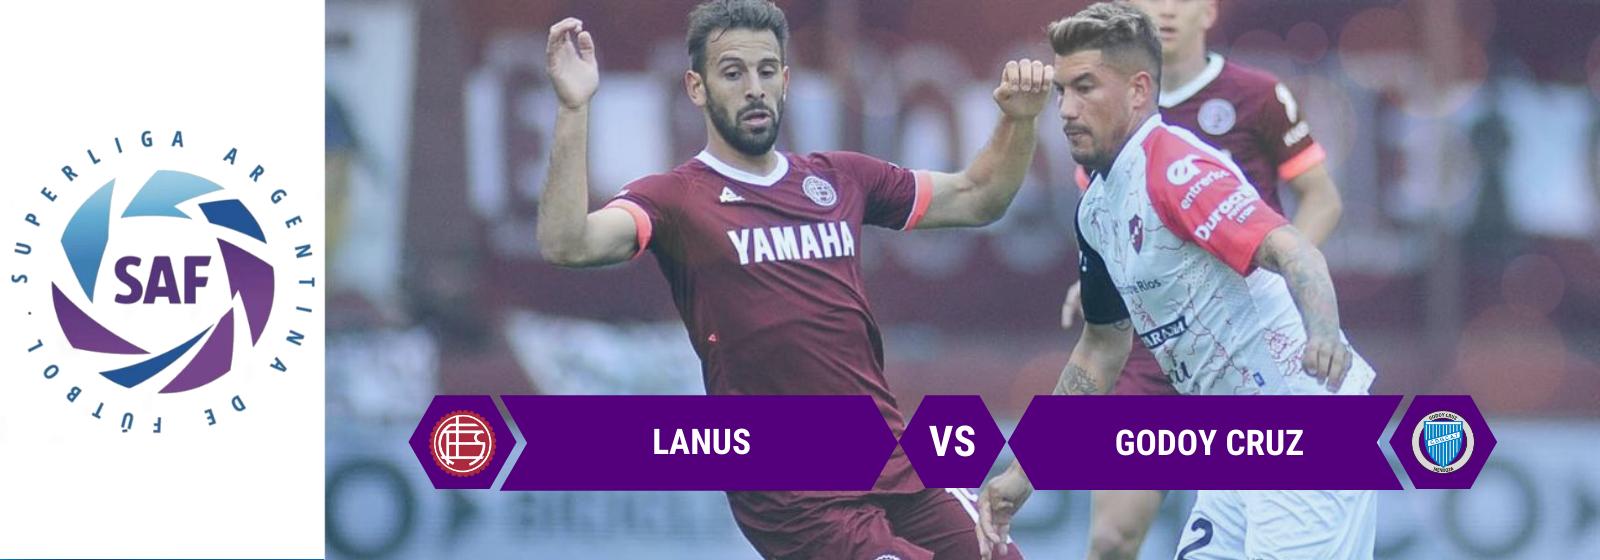 Asianconnect: Lanus vs Godoy Cruz Odds for February 02, 2020